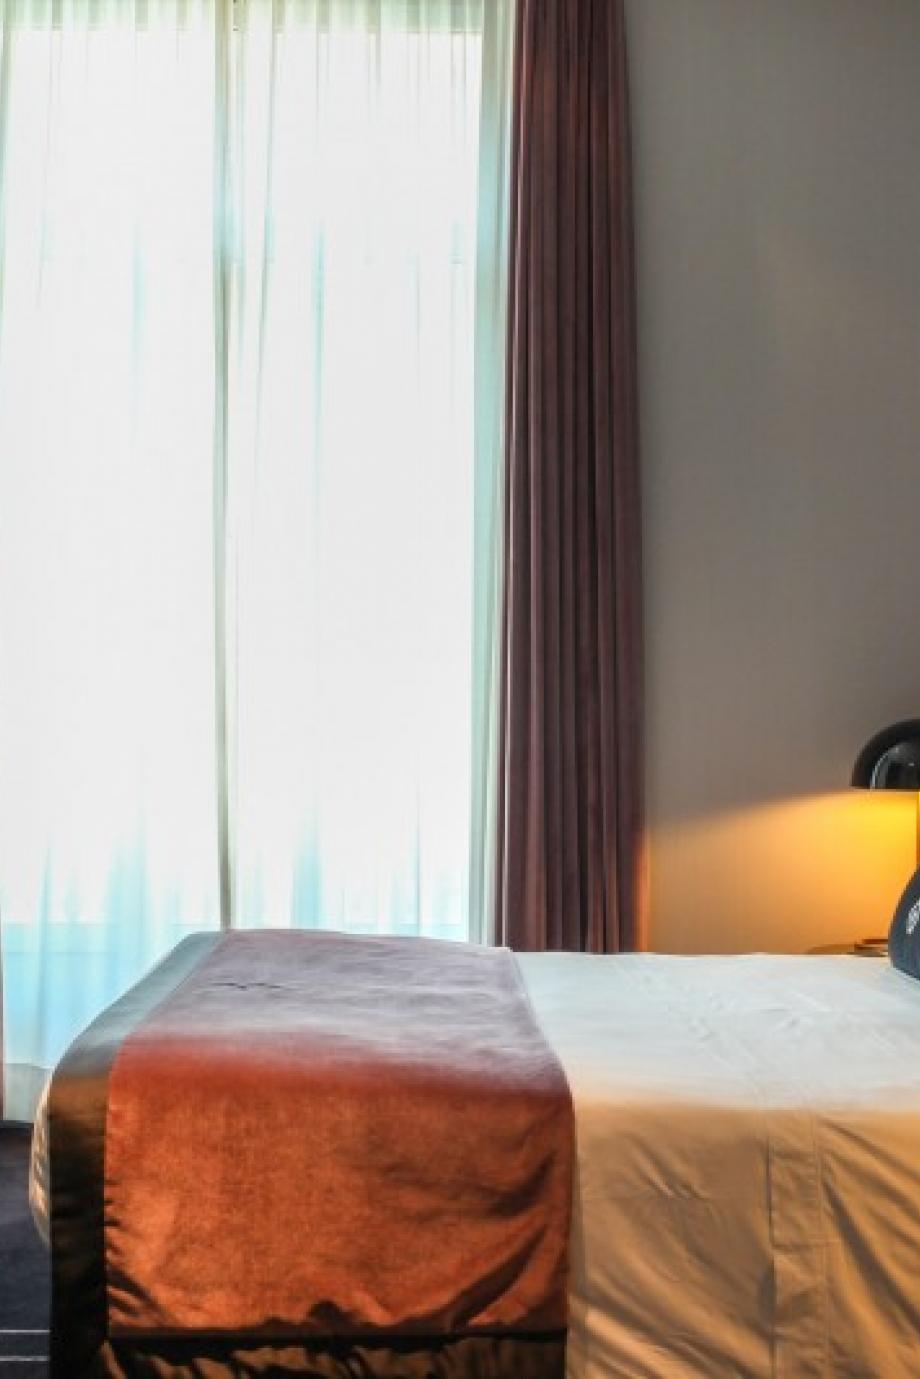 lisboa_cool_dormir_hotel_altis_avenida_21.jpg